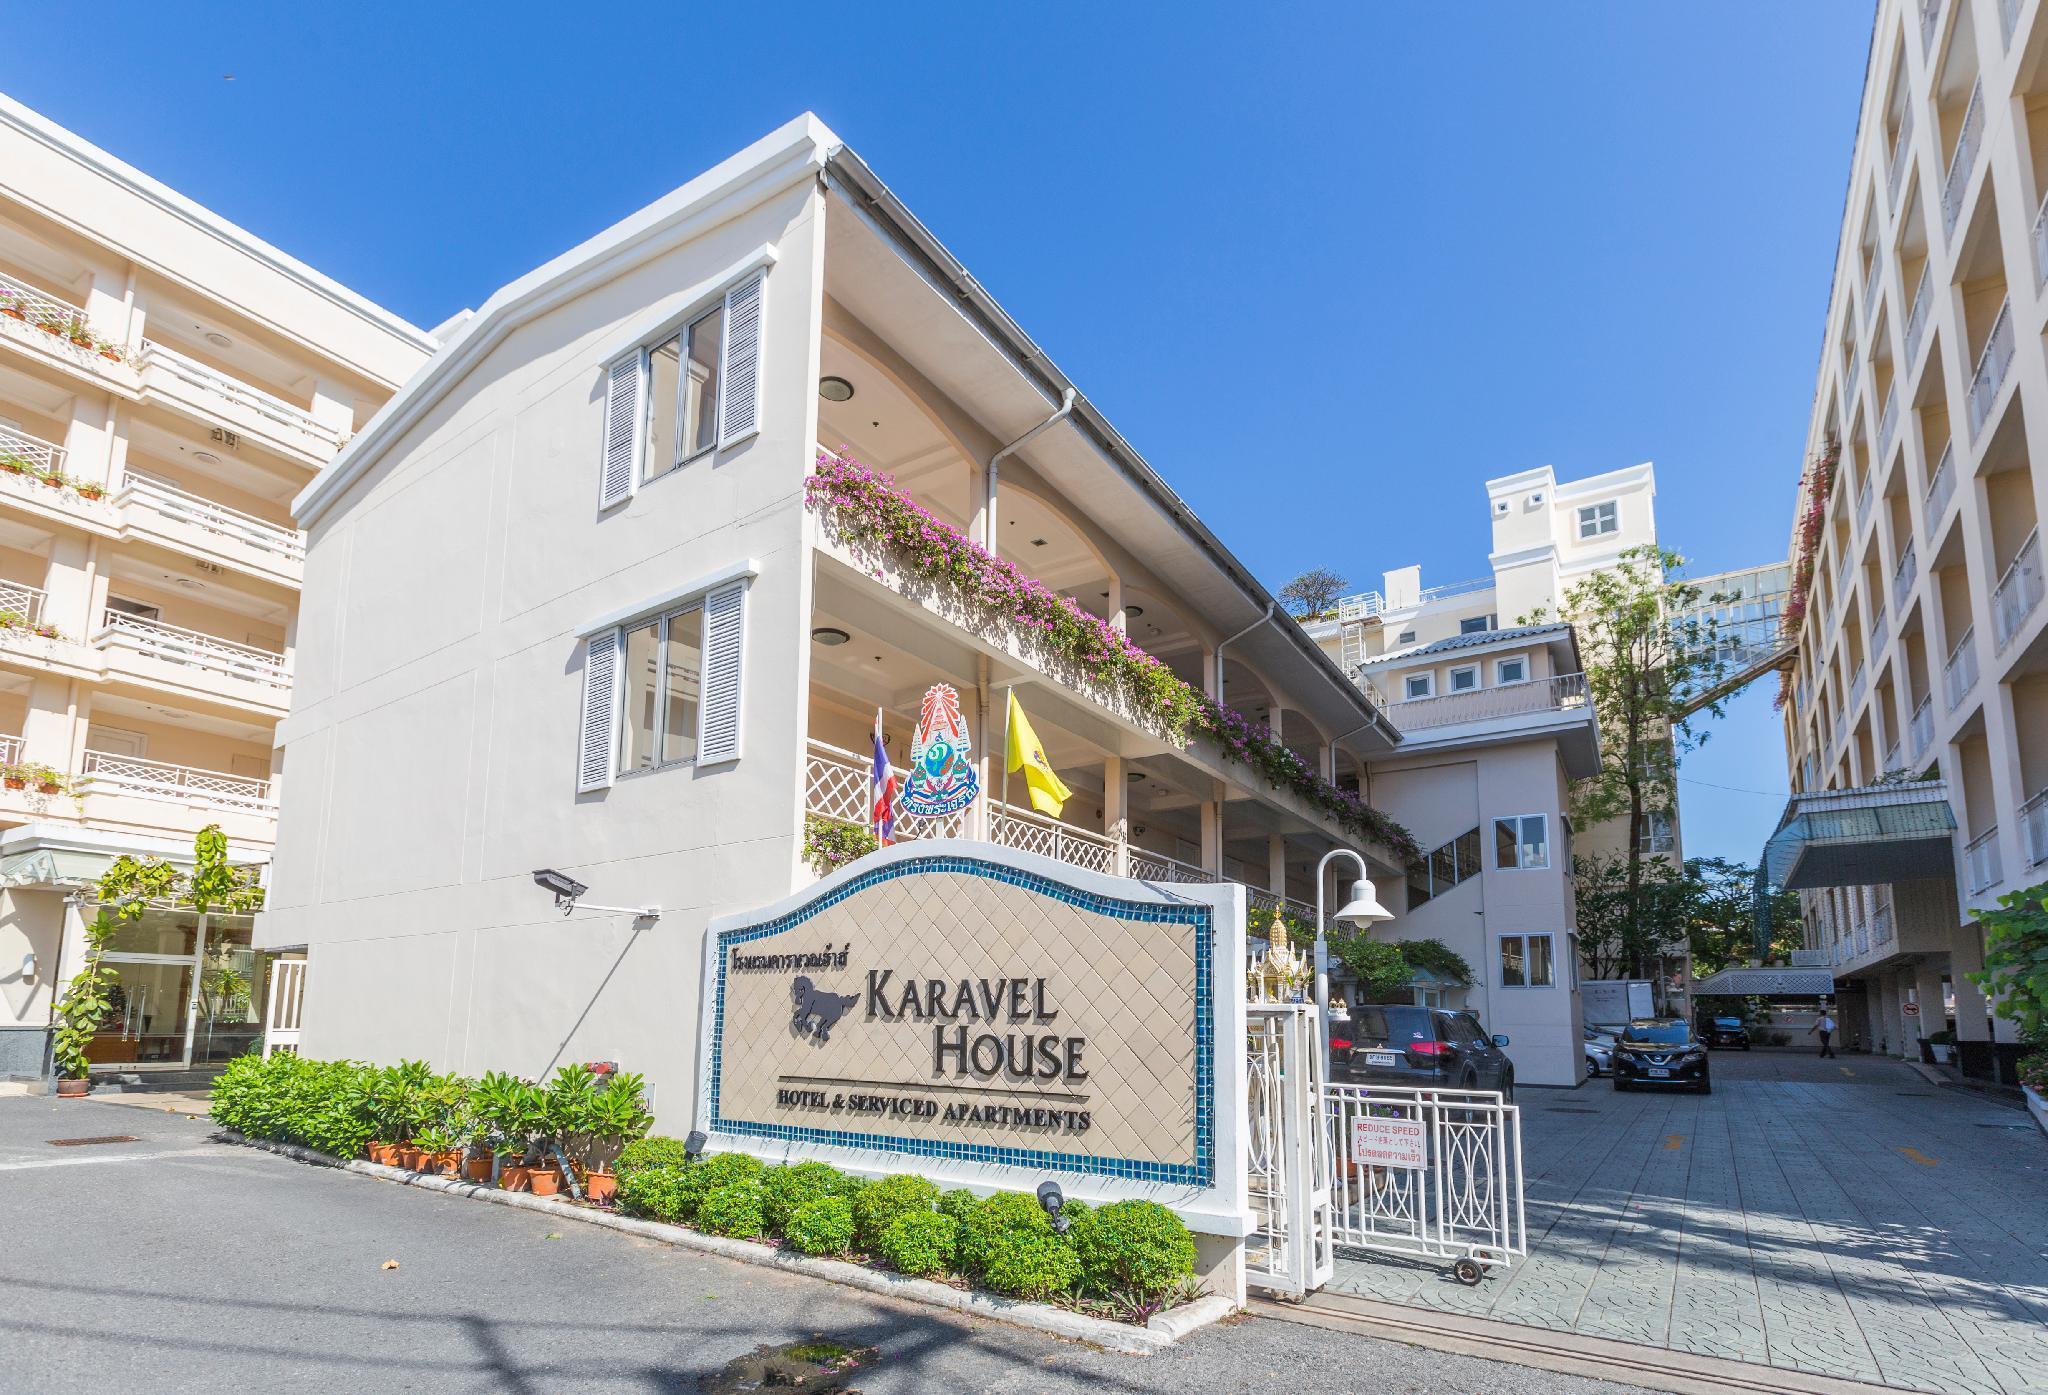 Karavel House Hotel & Serviced Apartments Sriracha คาราเวล เฮาส์ โฮเต็ลแอนด์เซอร์วิซ อพาร์ตเมนต์ ศรีราชา